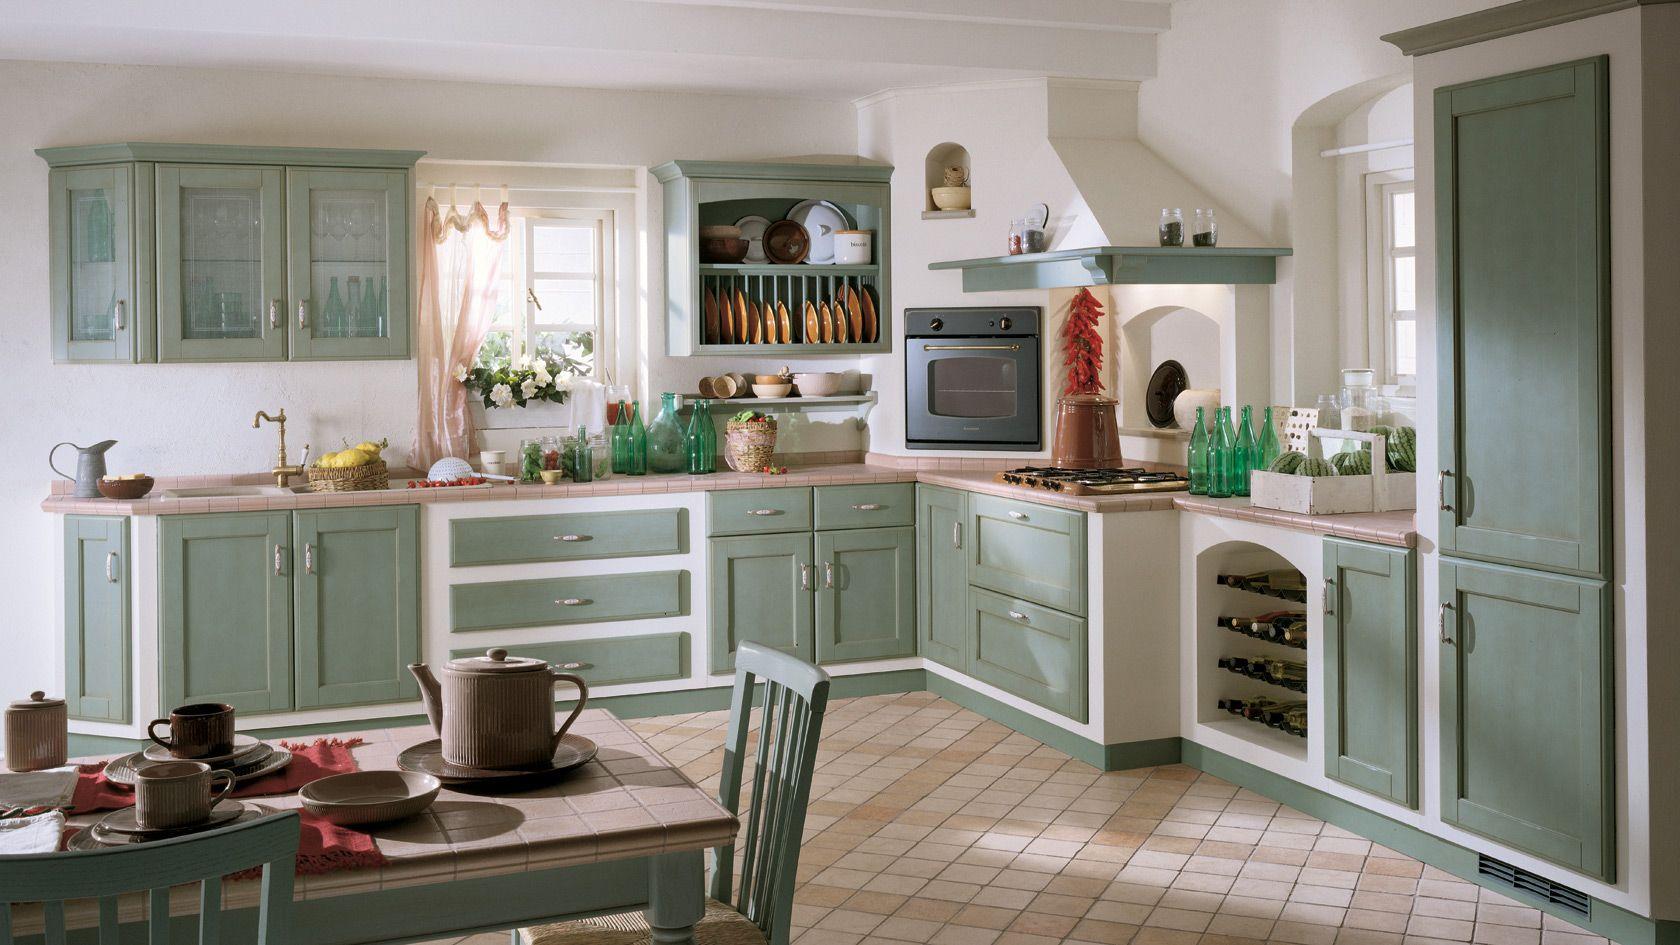 Cucina Cora Scavolini | Kitchens | Pinterest | Cucina, Kitchens and ...